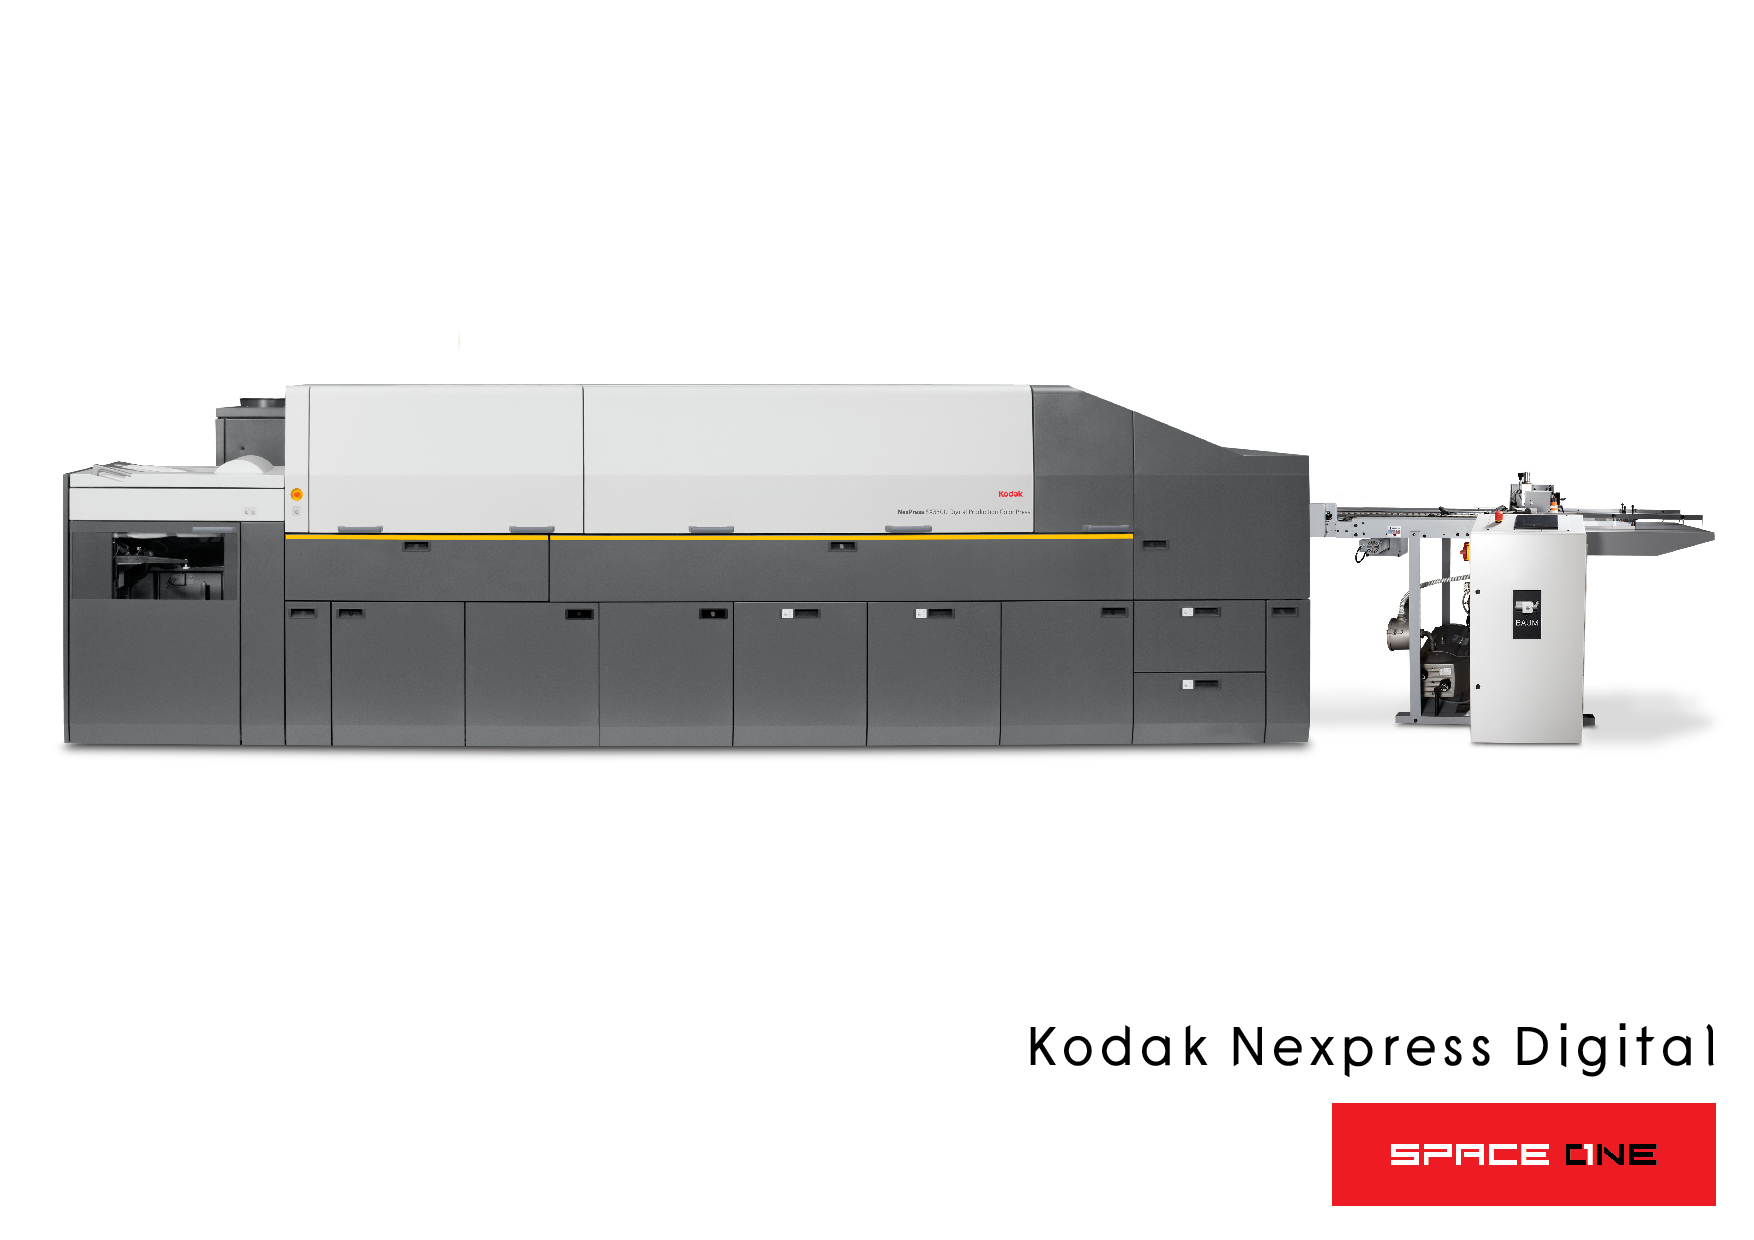 Kodak-01.jpg